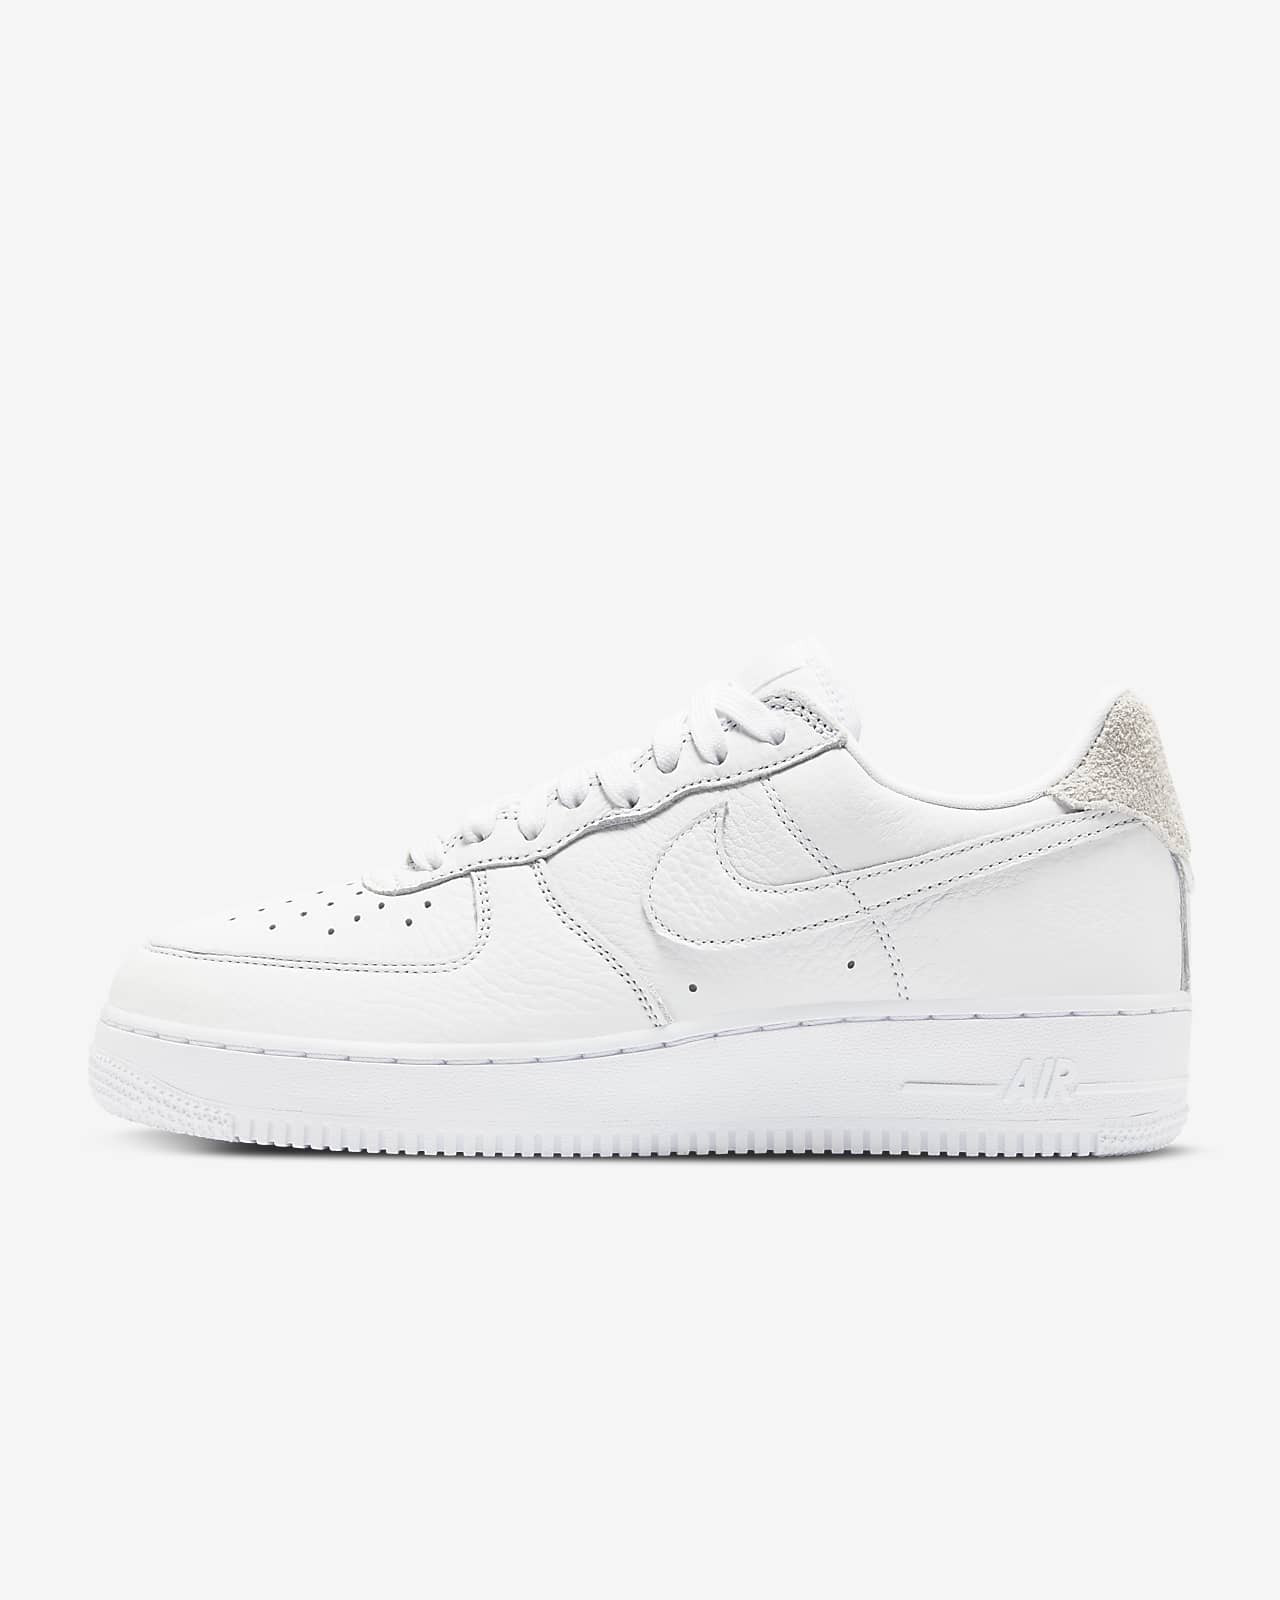 Nike Air Force 1 '07 Craft Men's Shoe